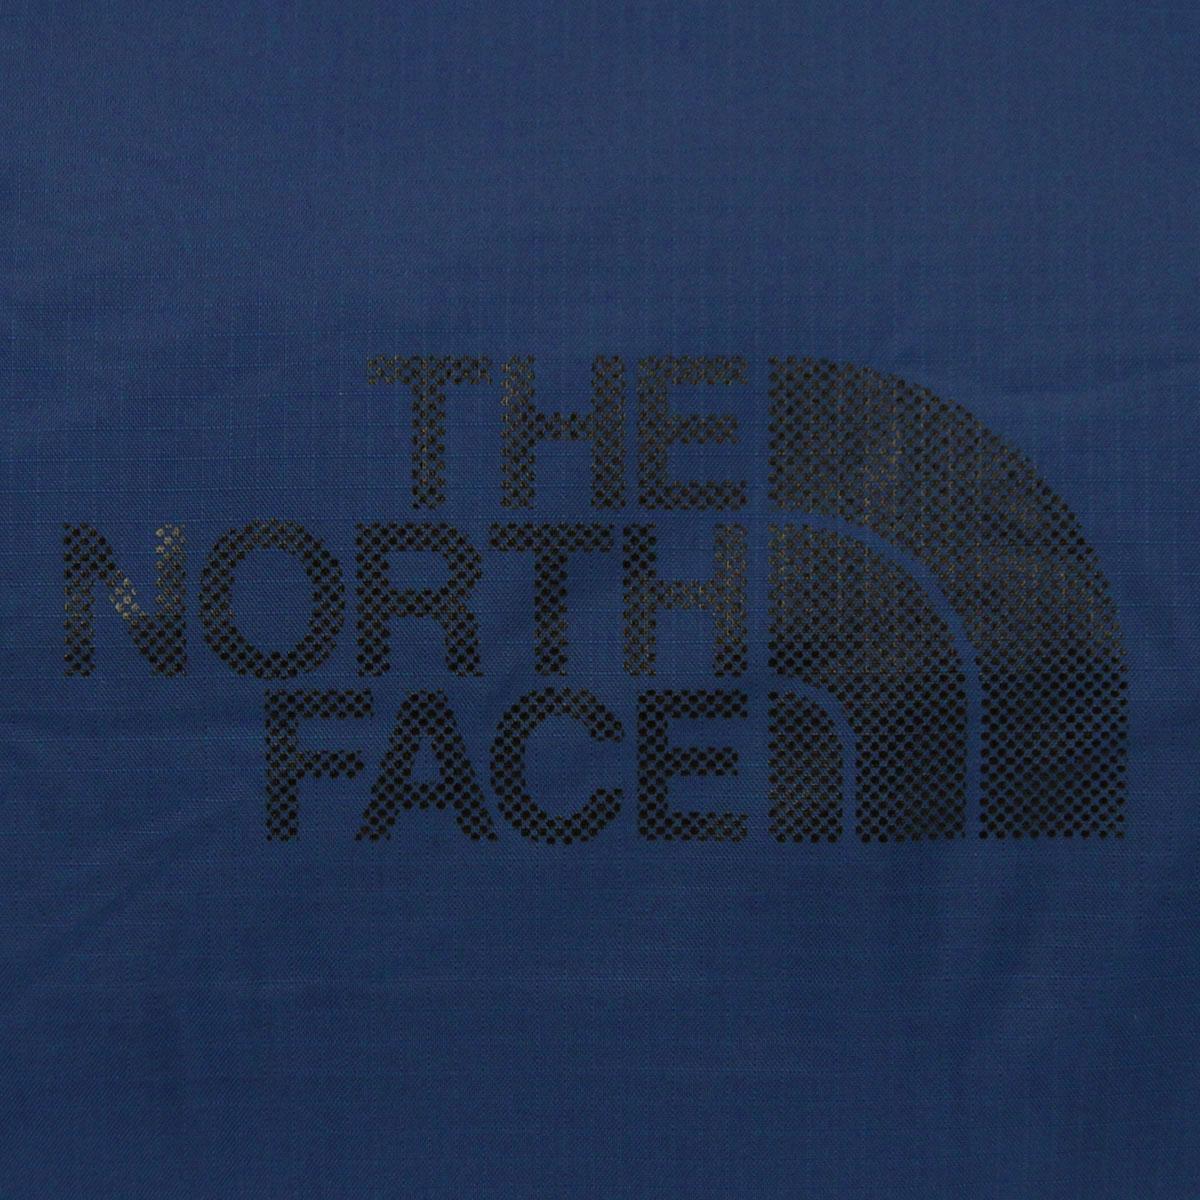 nothface_1